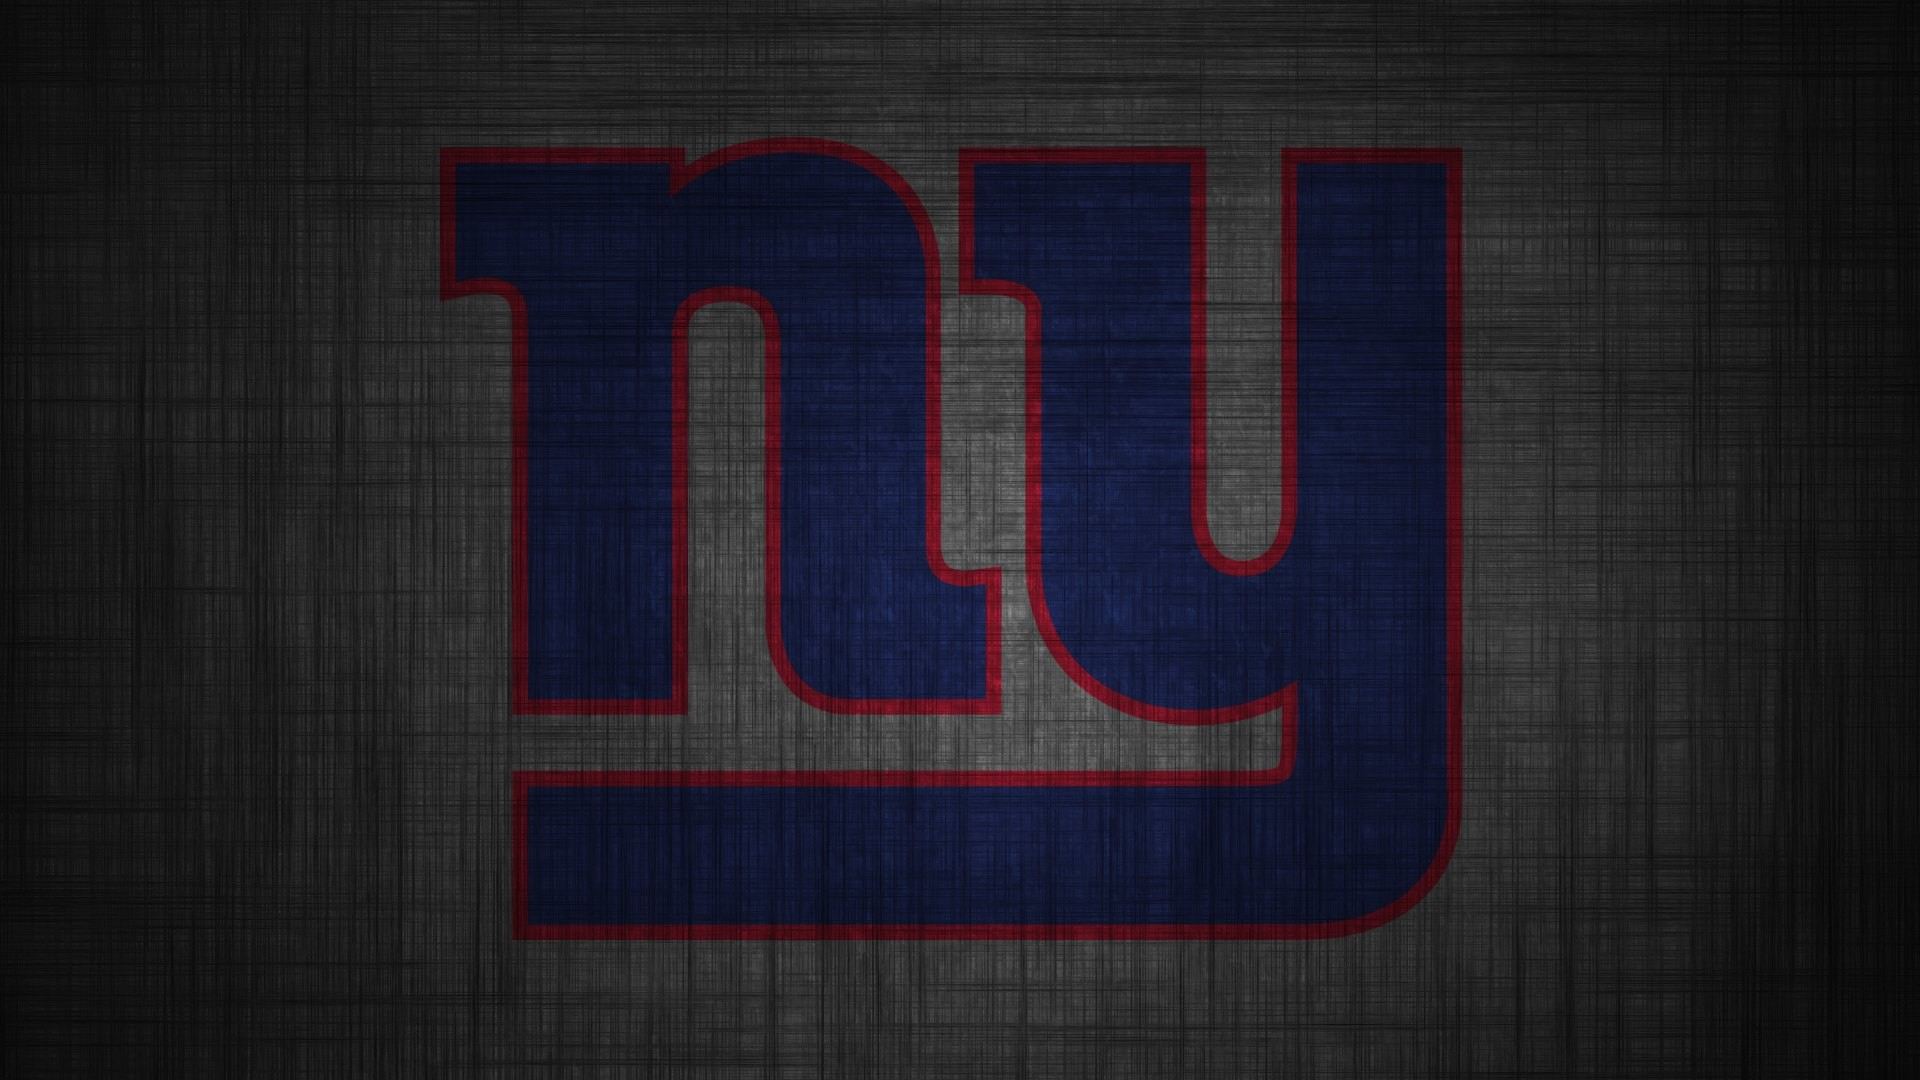 11 HD New York Giants Wallpapers